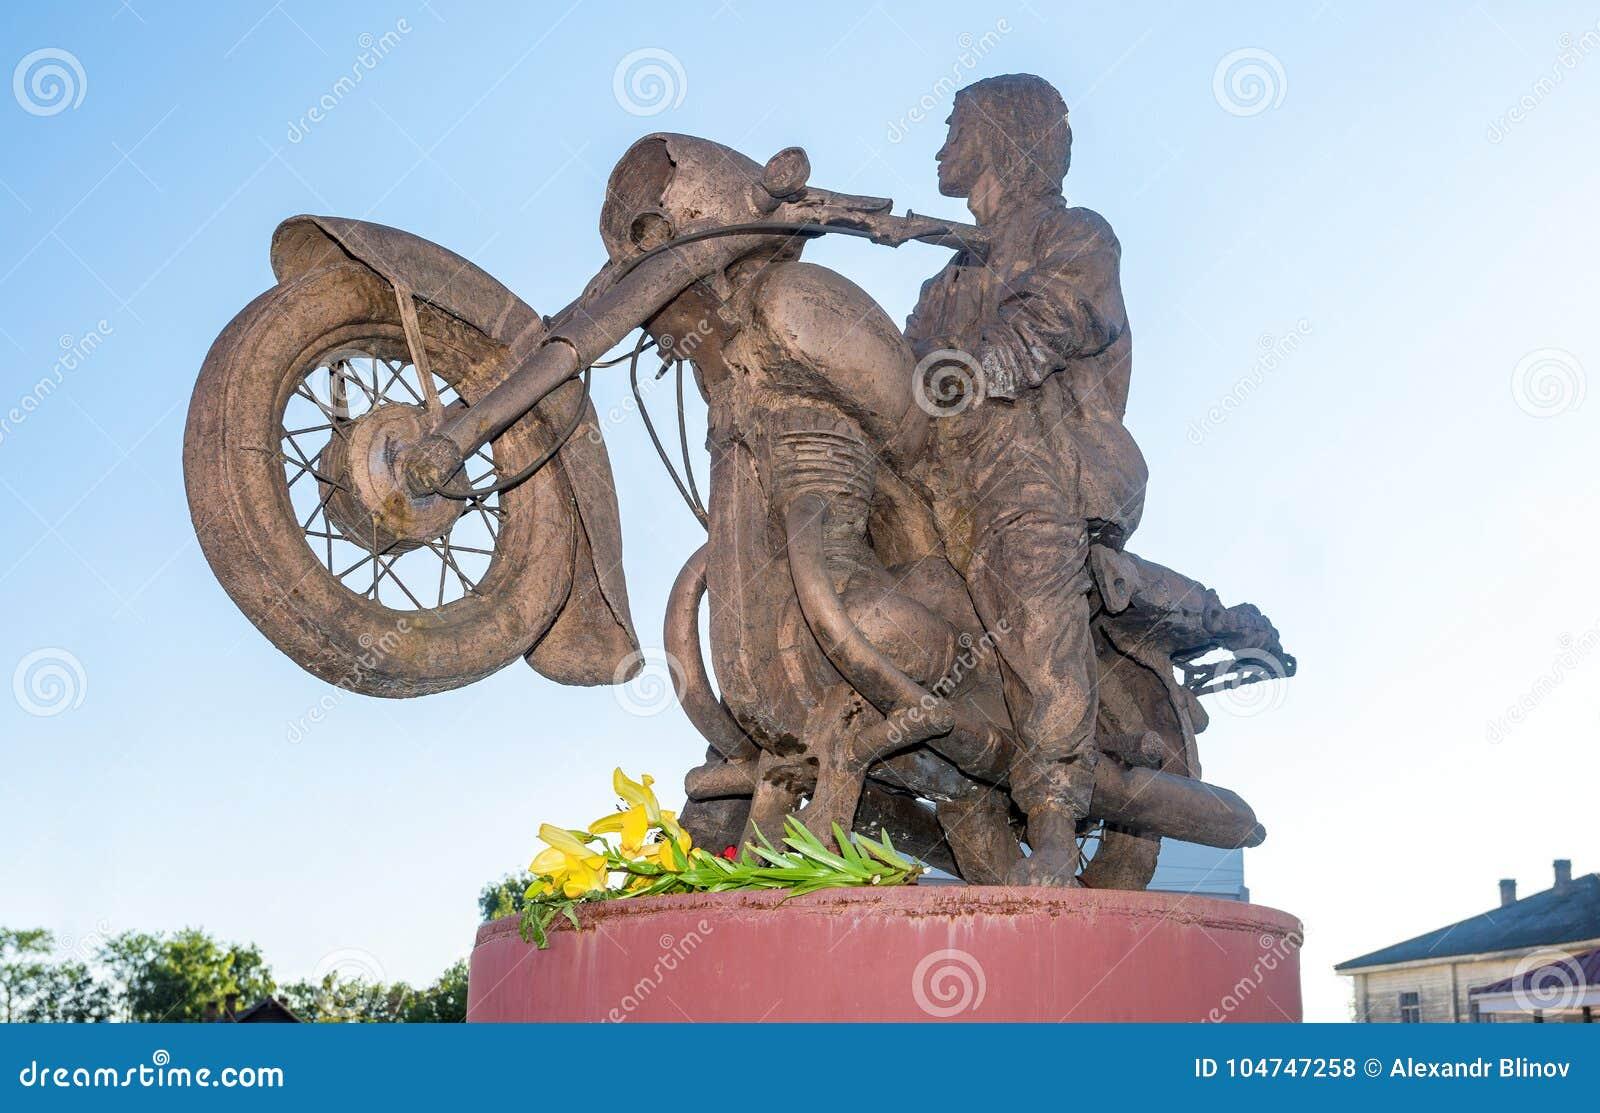 Monument to Viktor Tsoi will go to the Novgorod region 09/29/2015 95